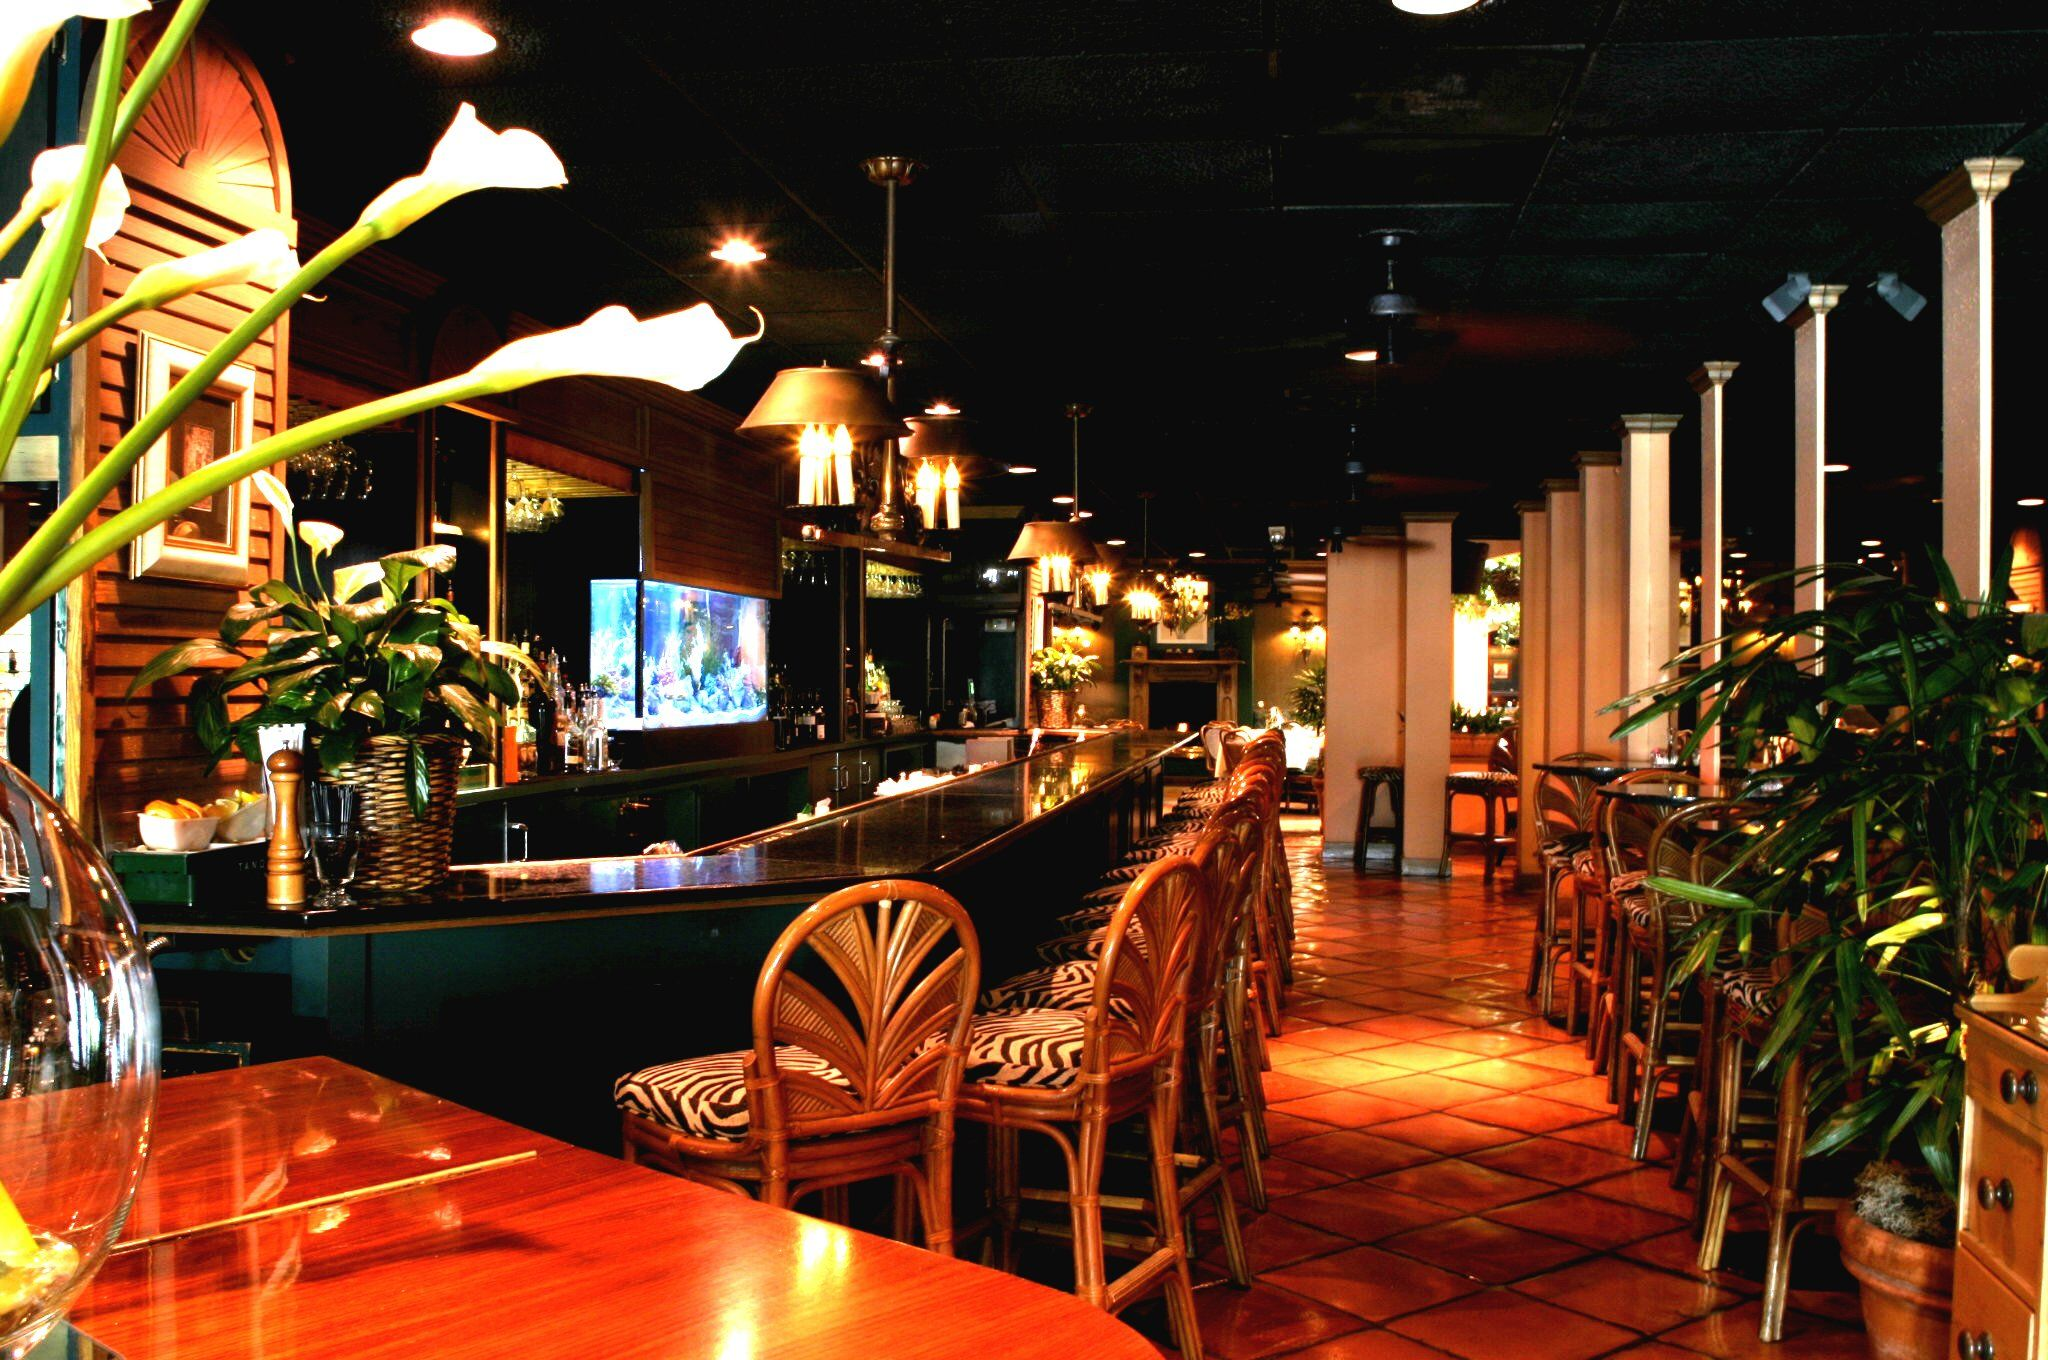 Taboo Restaurant | Palm Beach Proper | Pinterest | Photos and ...